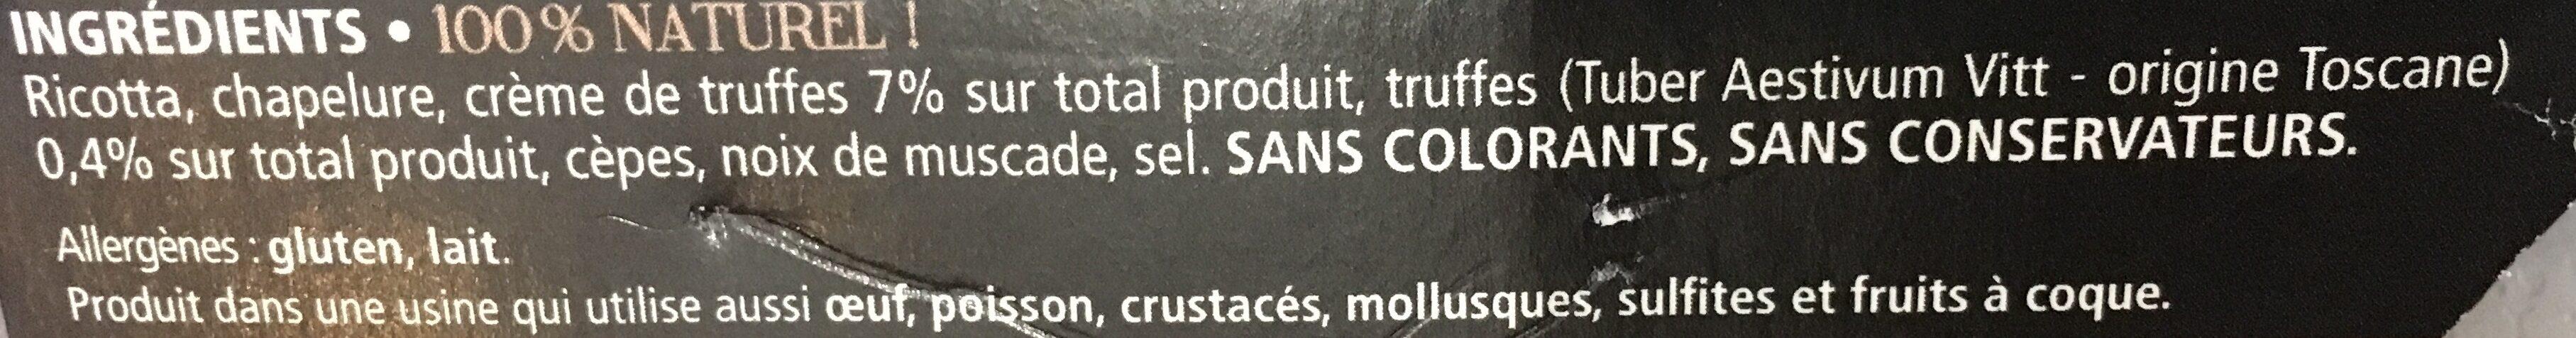 Gnudi aux truffes - Ingredients